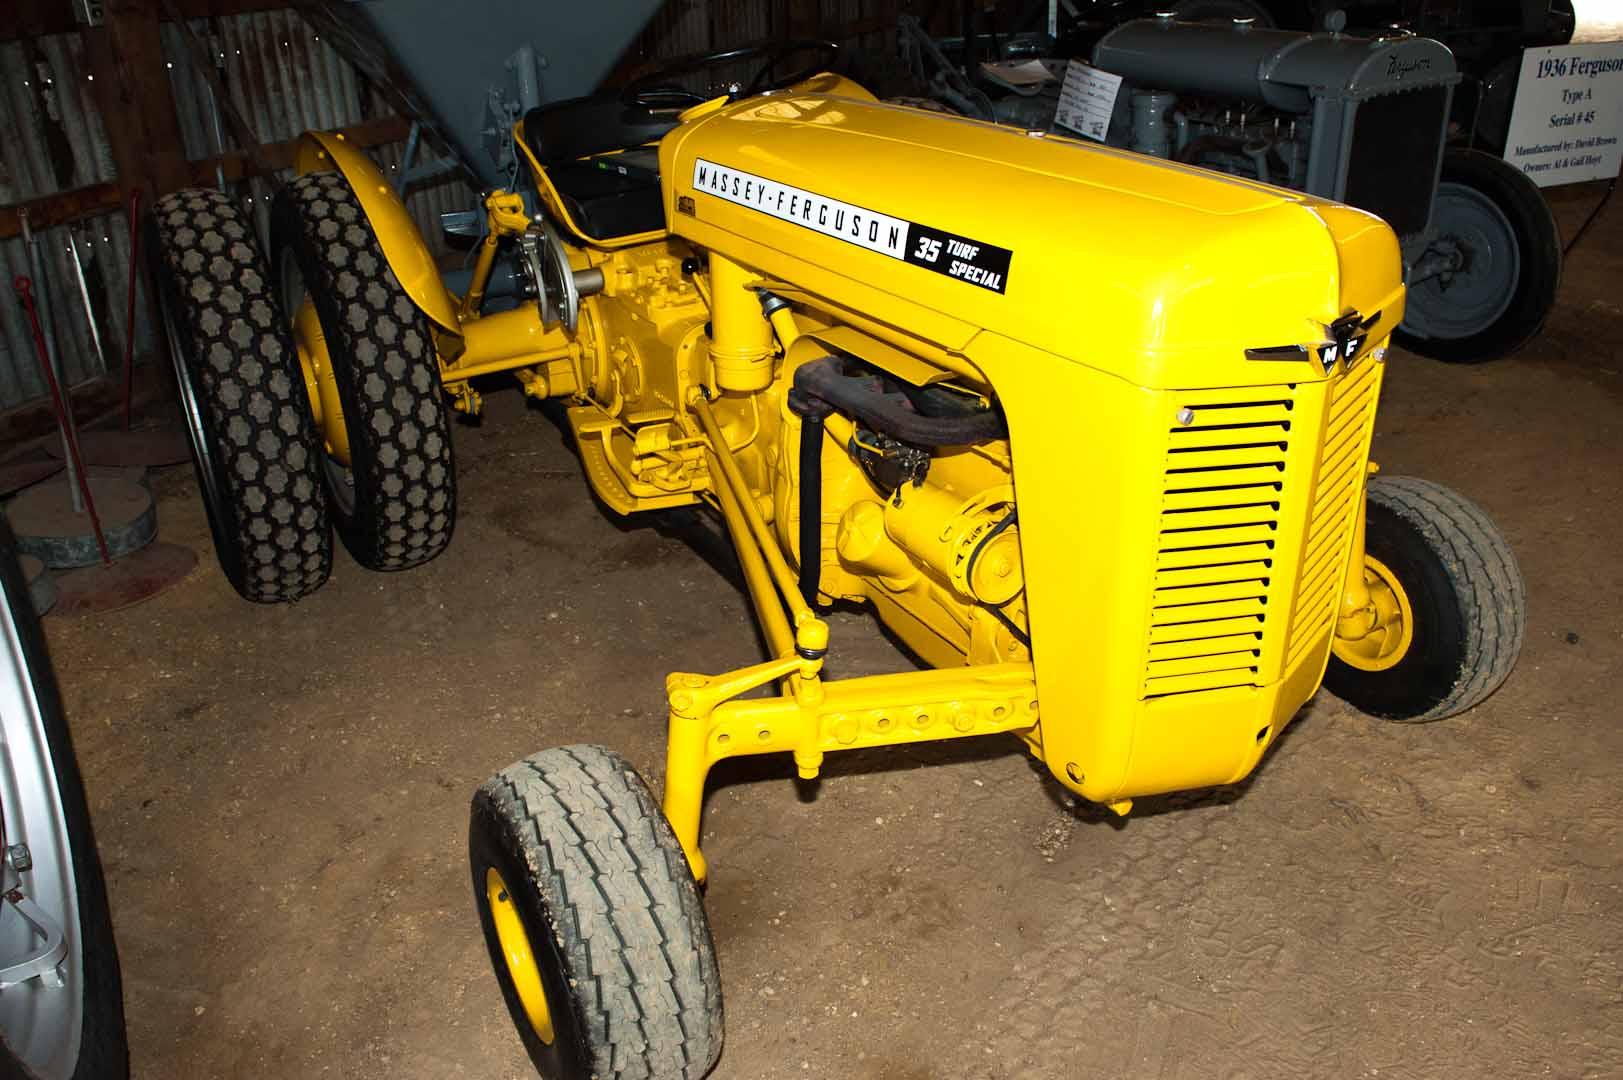 Gallery – MF-35 Tractor – Ferguson Enthusiasts of North America